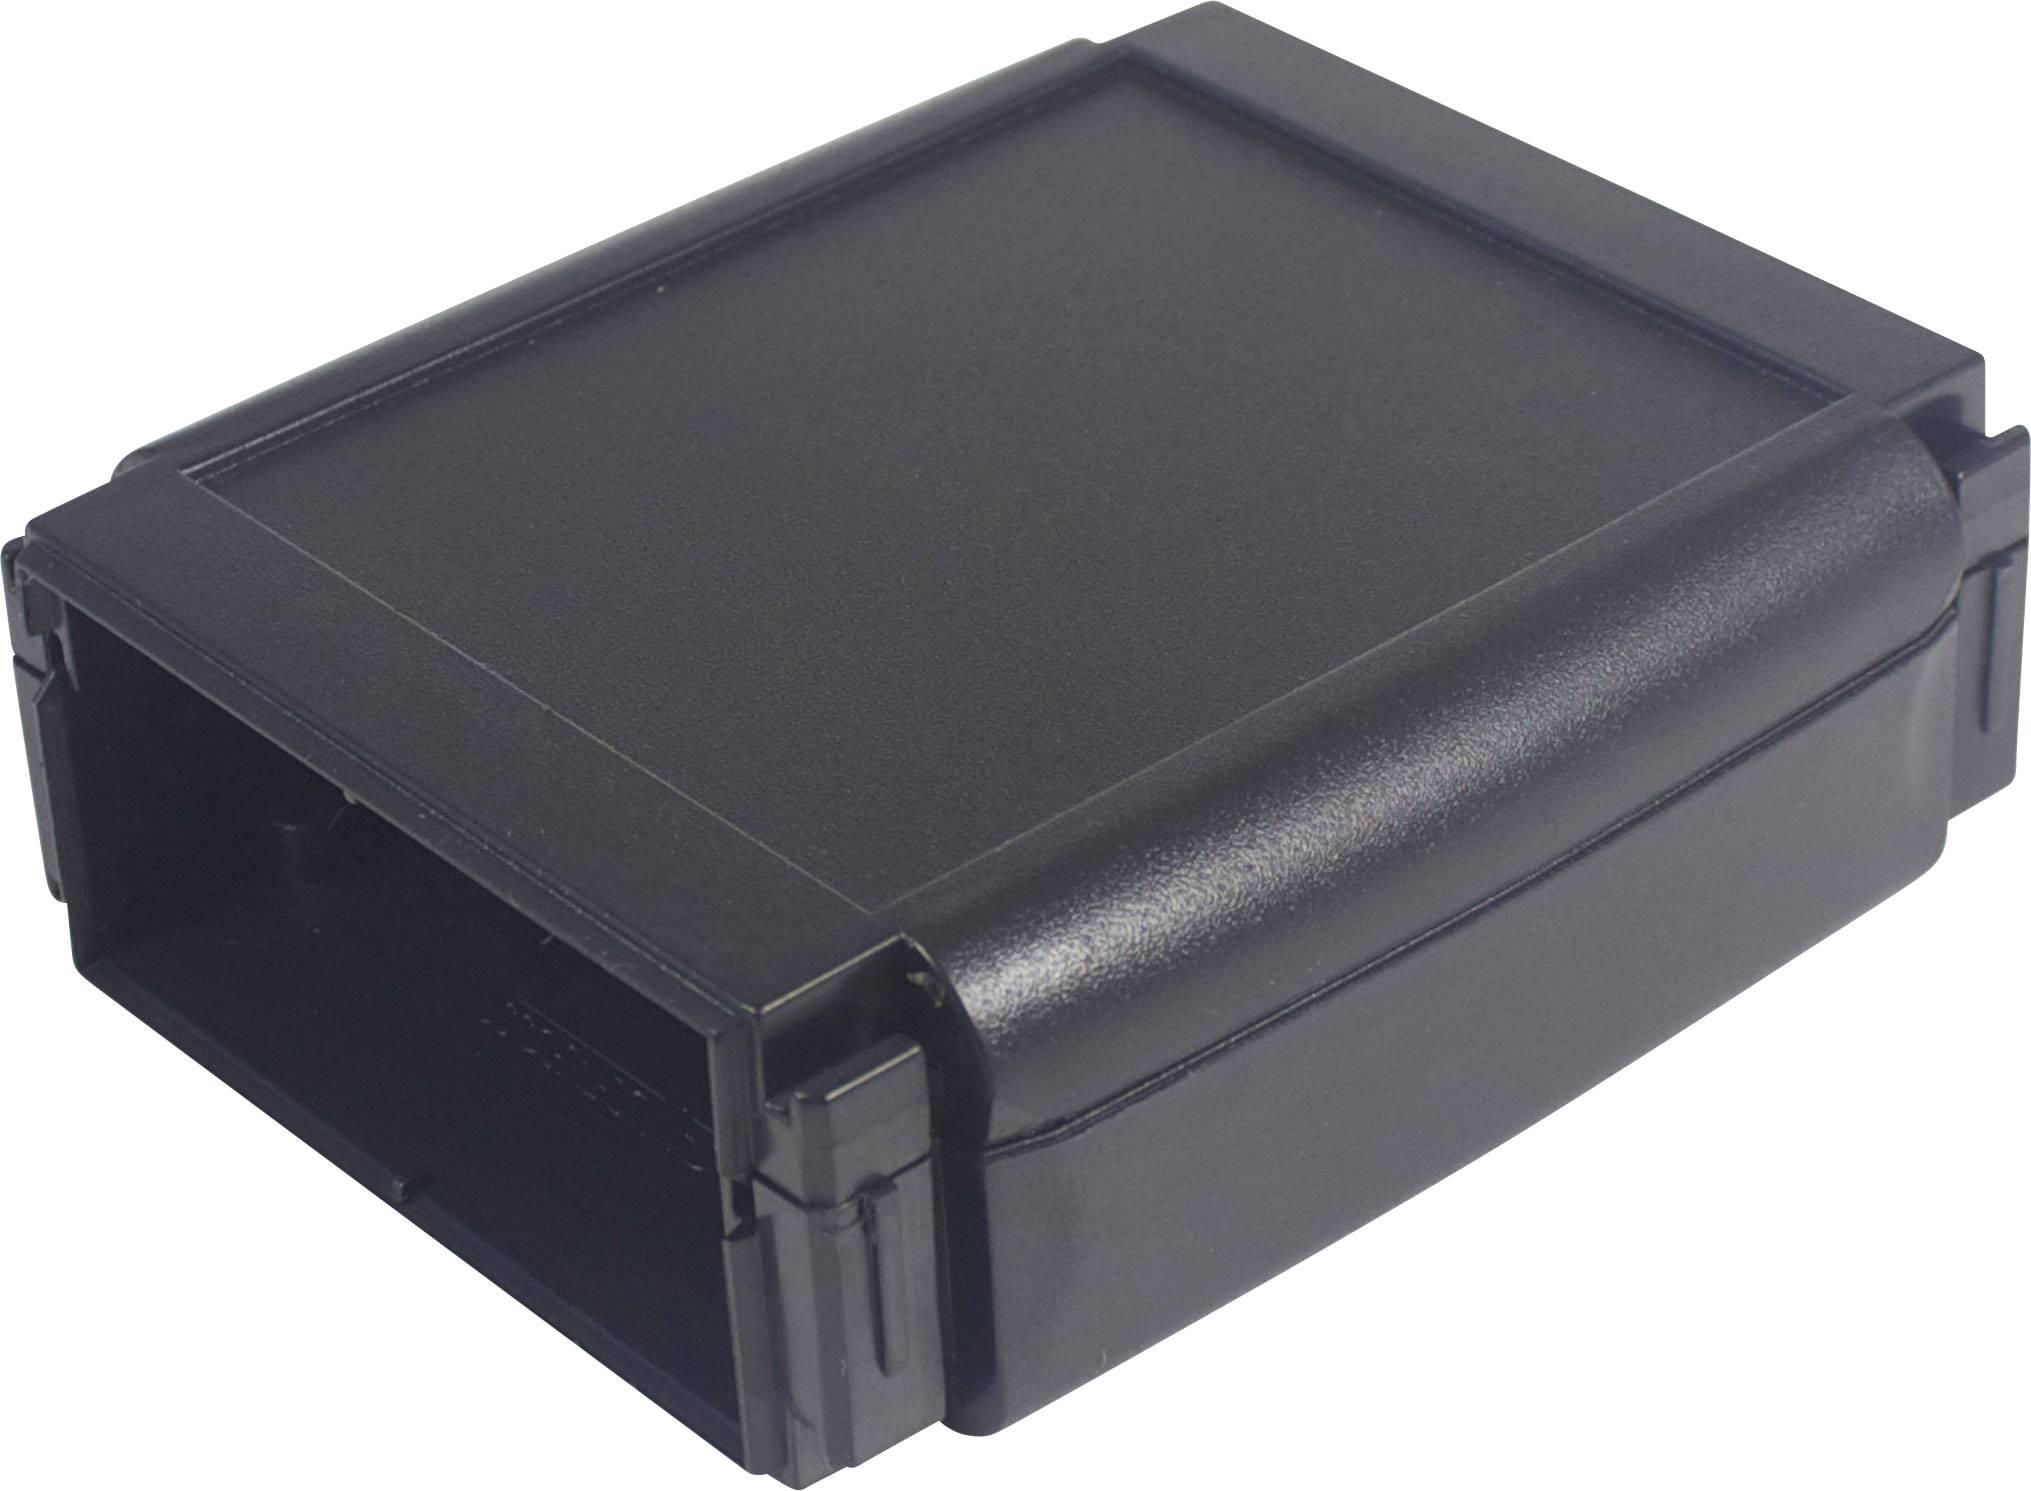 Plastová krabička Axxatronic CHH642BBK, 100 x 80 x 30 mm, ABS, IP65, čierna, 1 ks